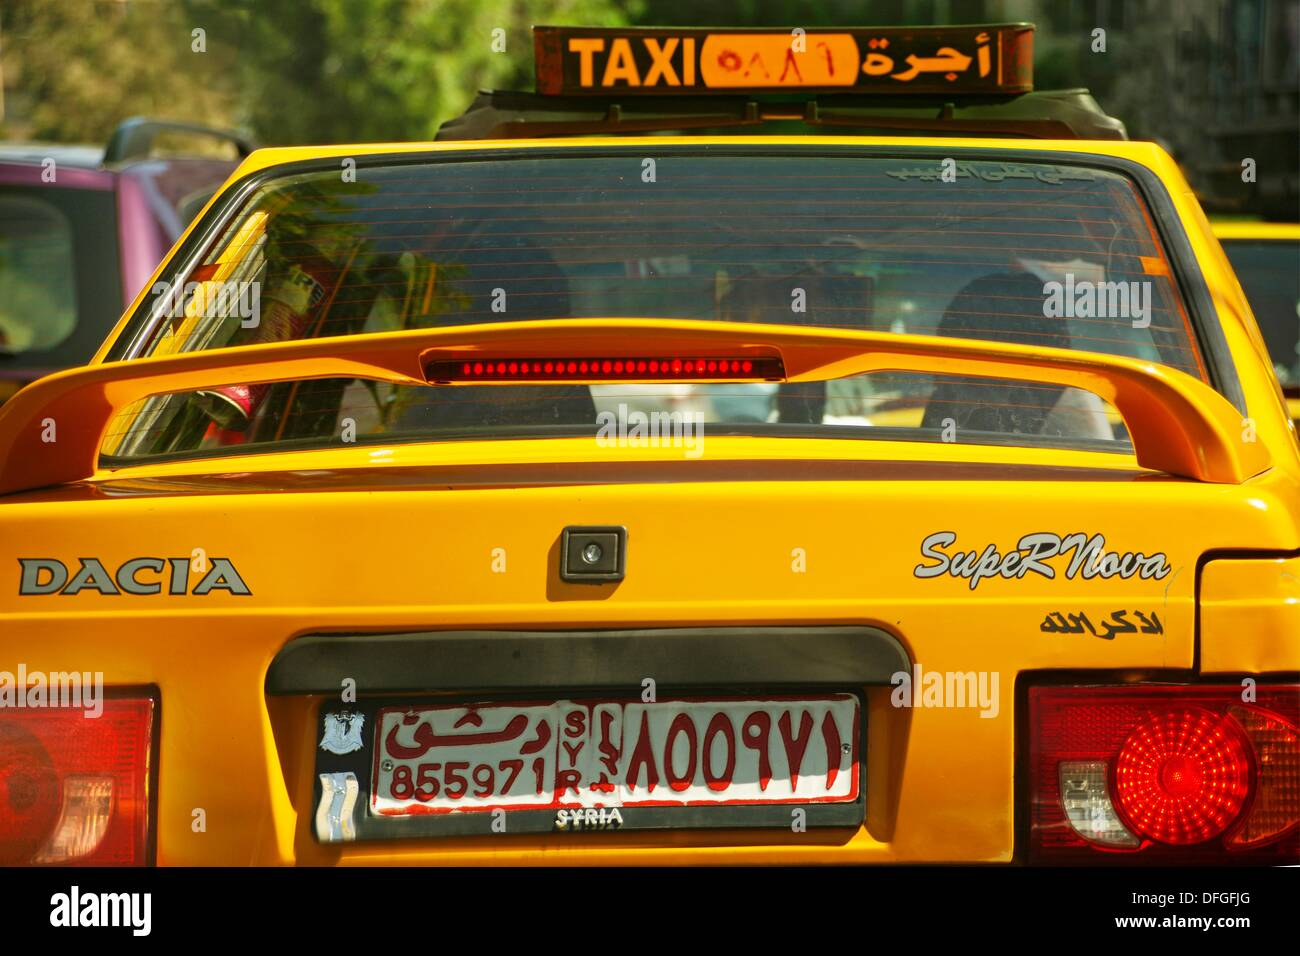 Taxi car at Damascus, Syria - Stock Image